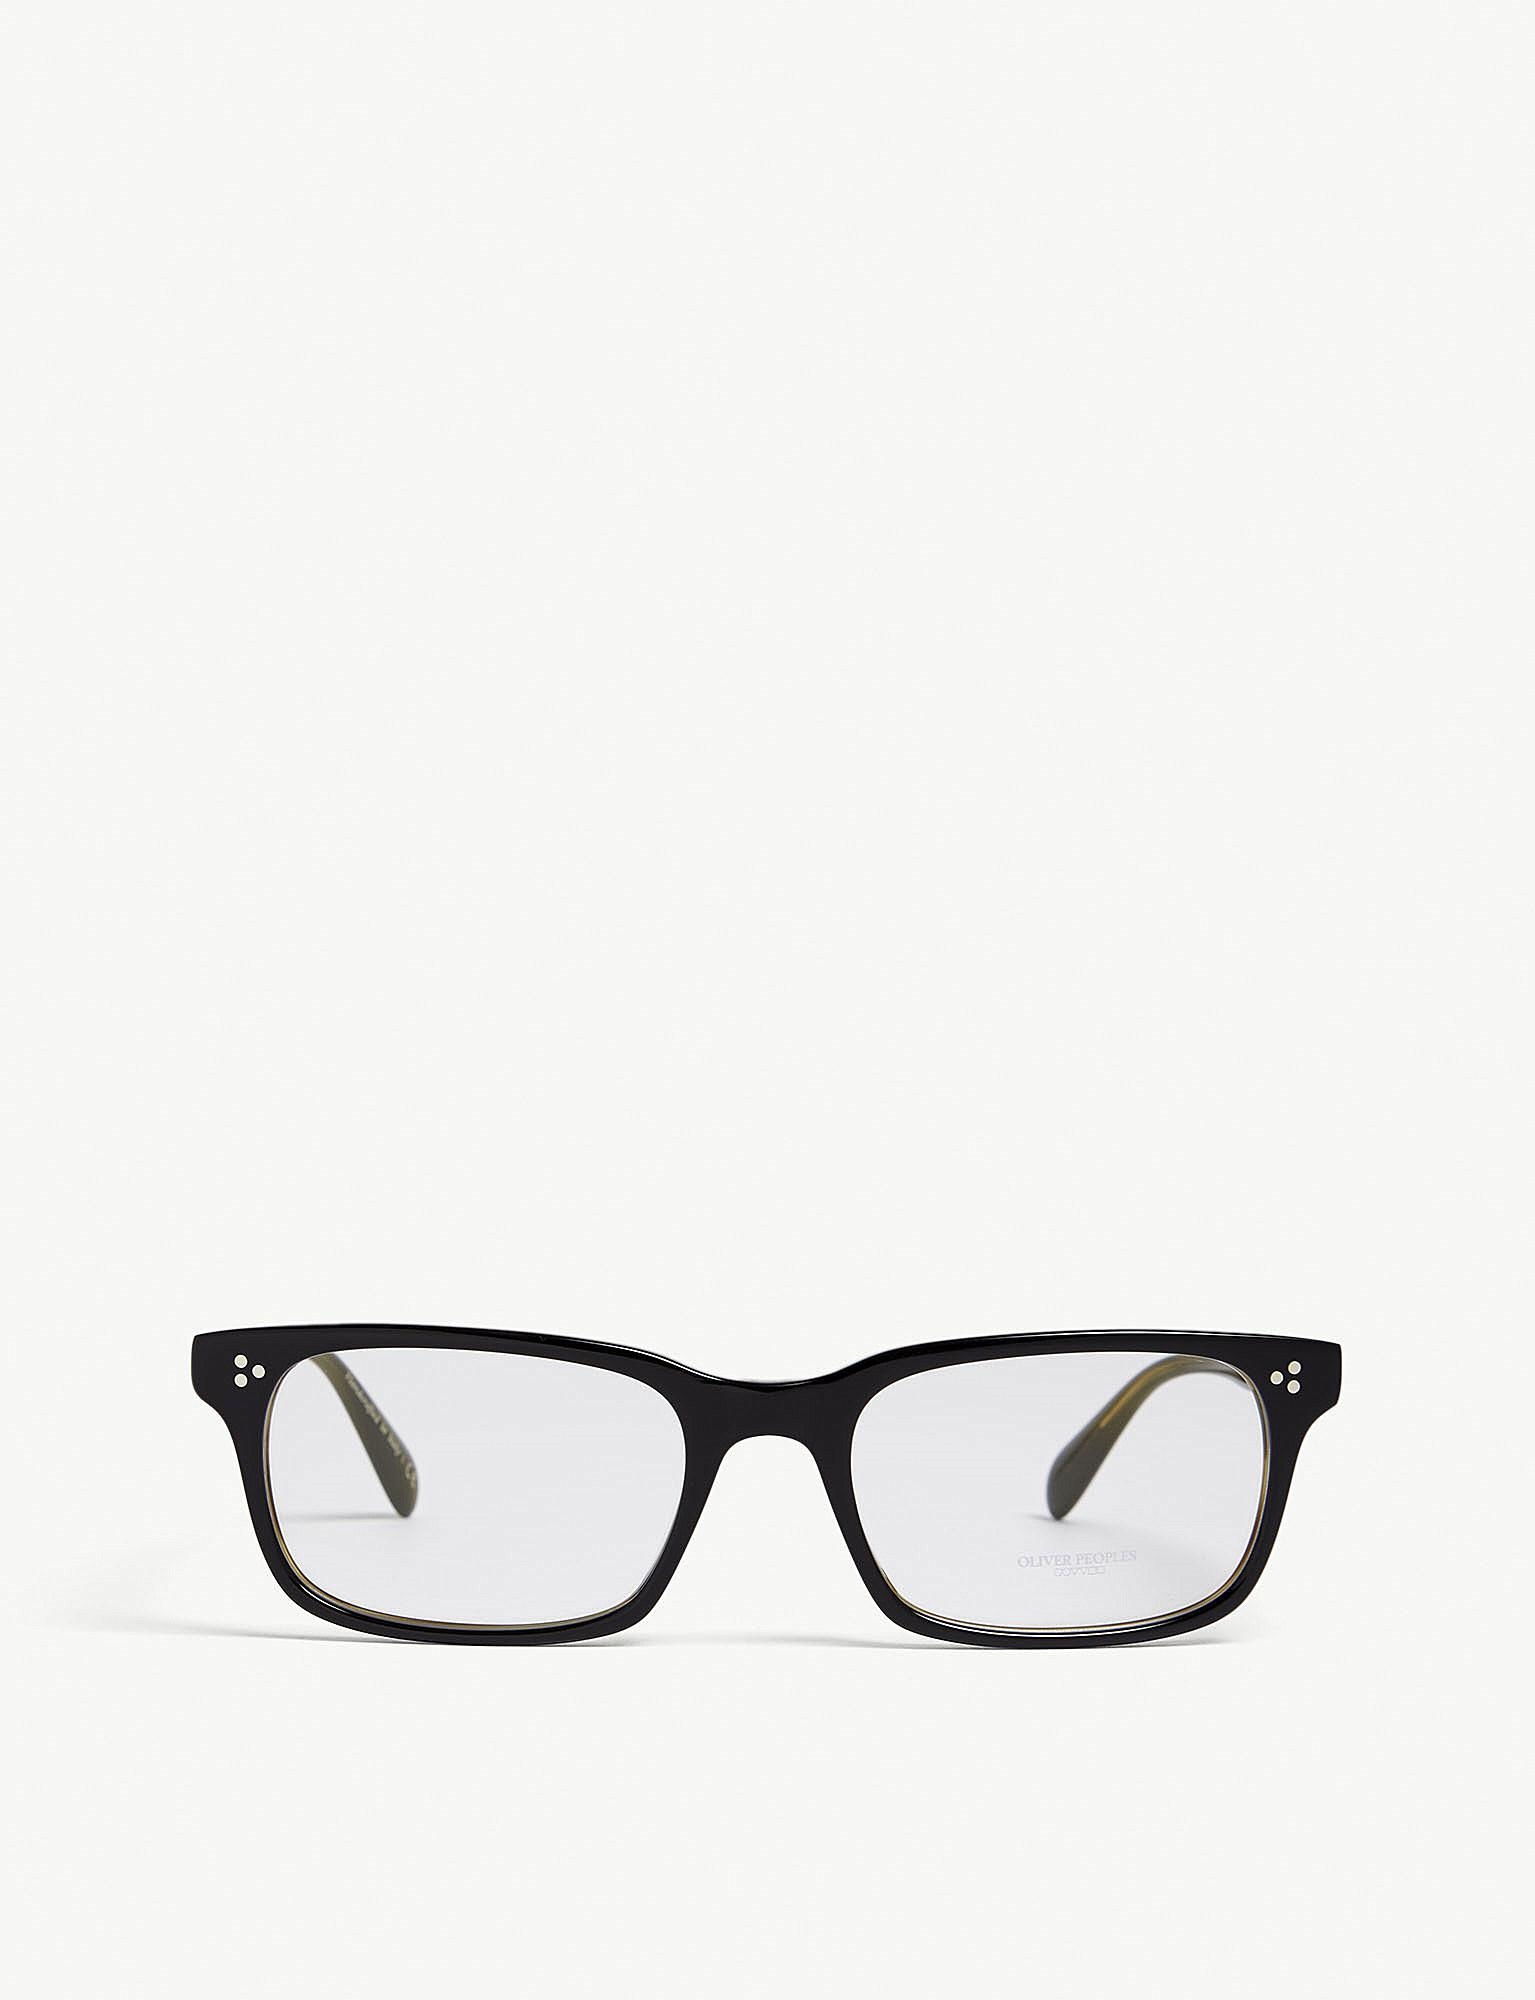 5788abd9a0 Oliver Peoples Cavalon Rectangle Glasses in Black - Save ...